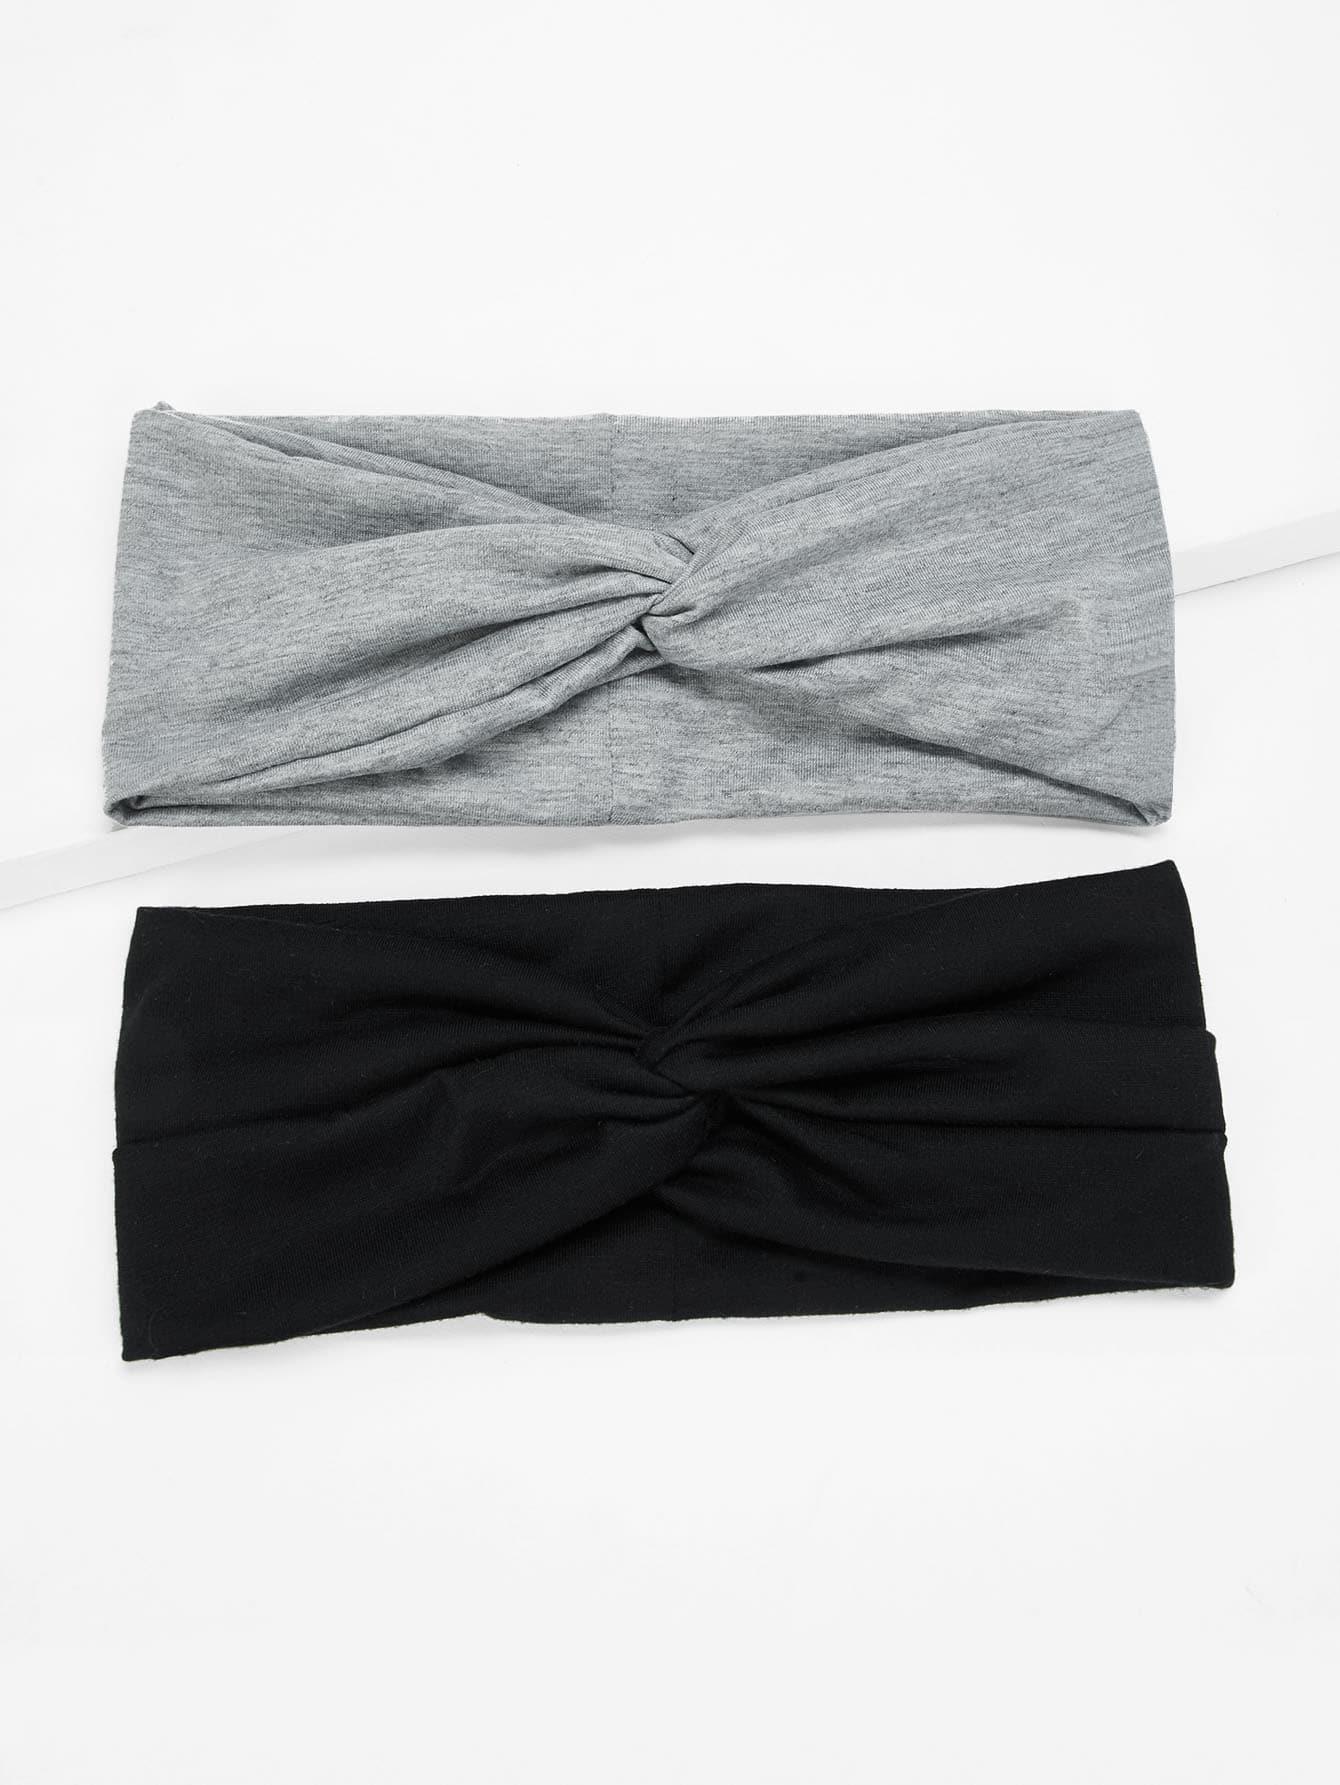 Купить Однотонная витая повязка на голову 2шт., null, SheIn